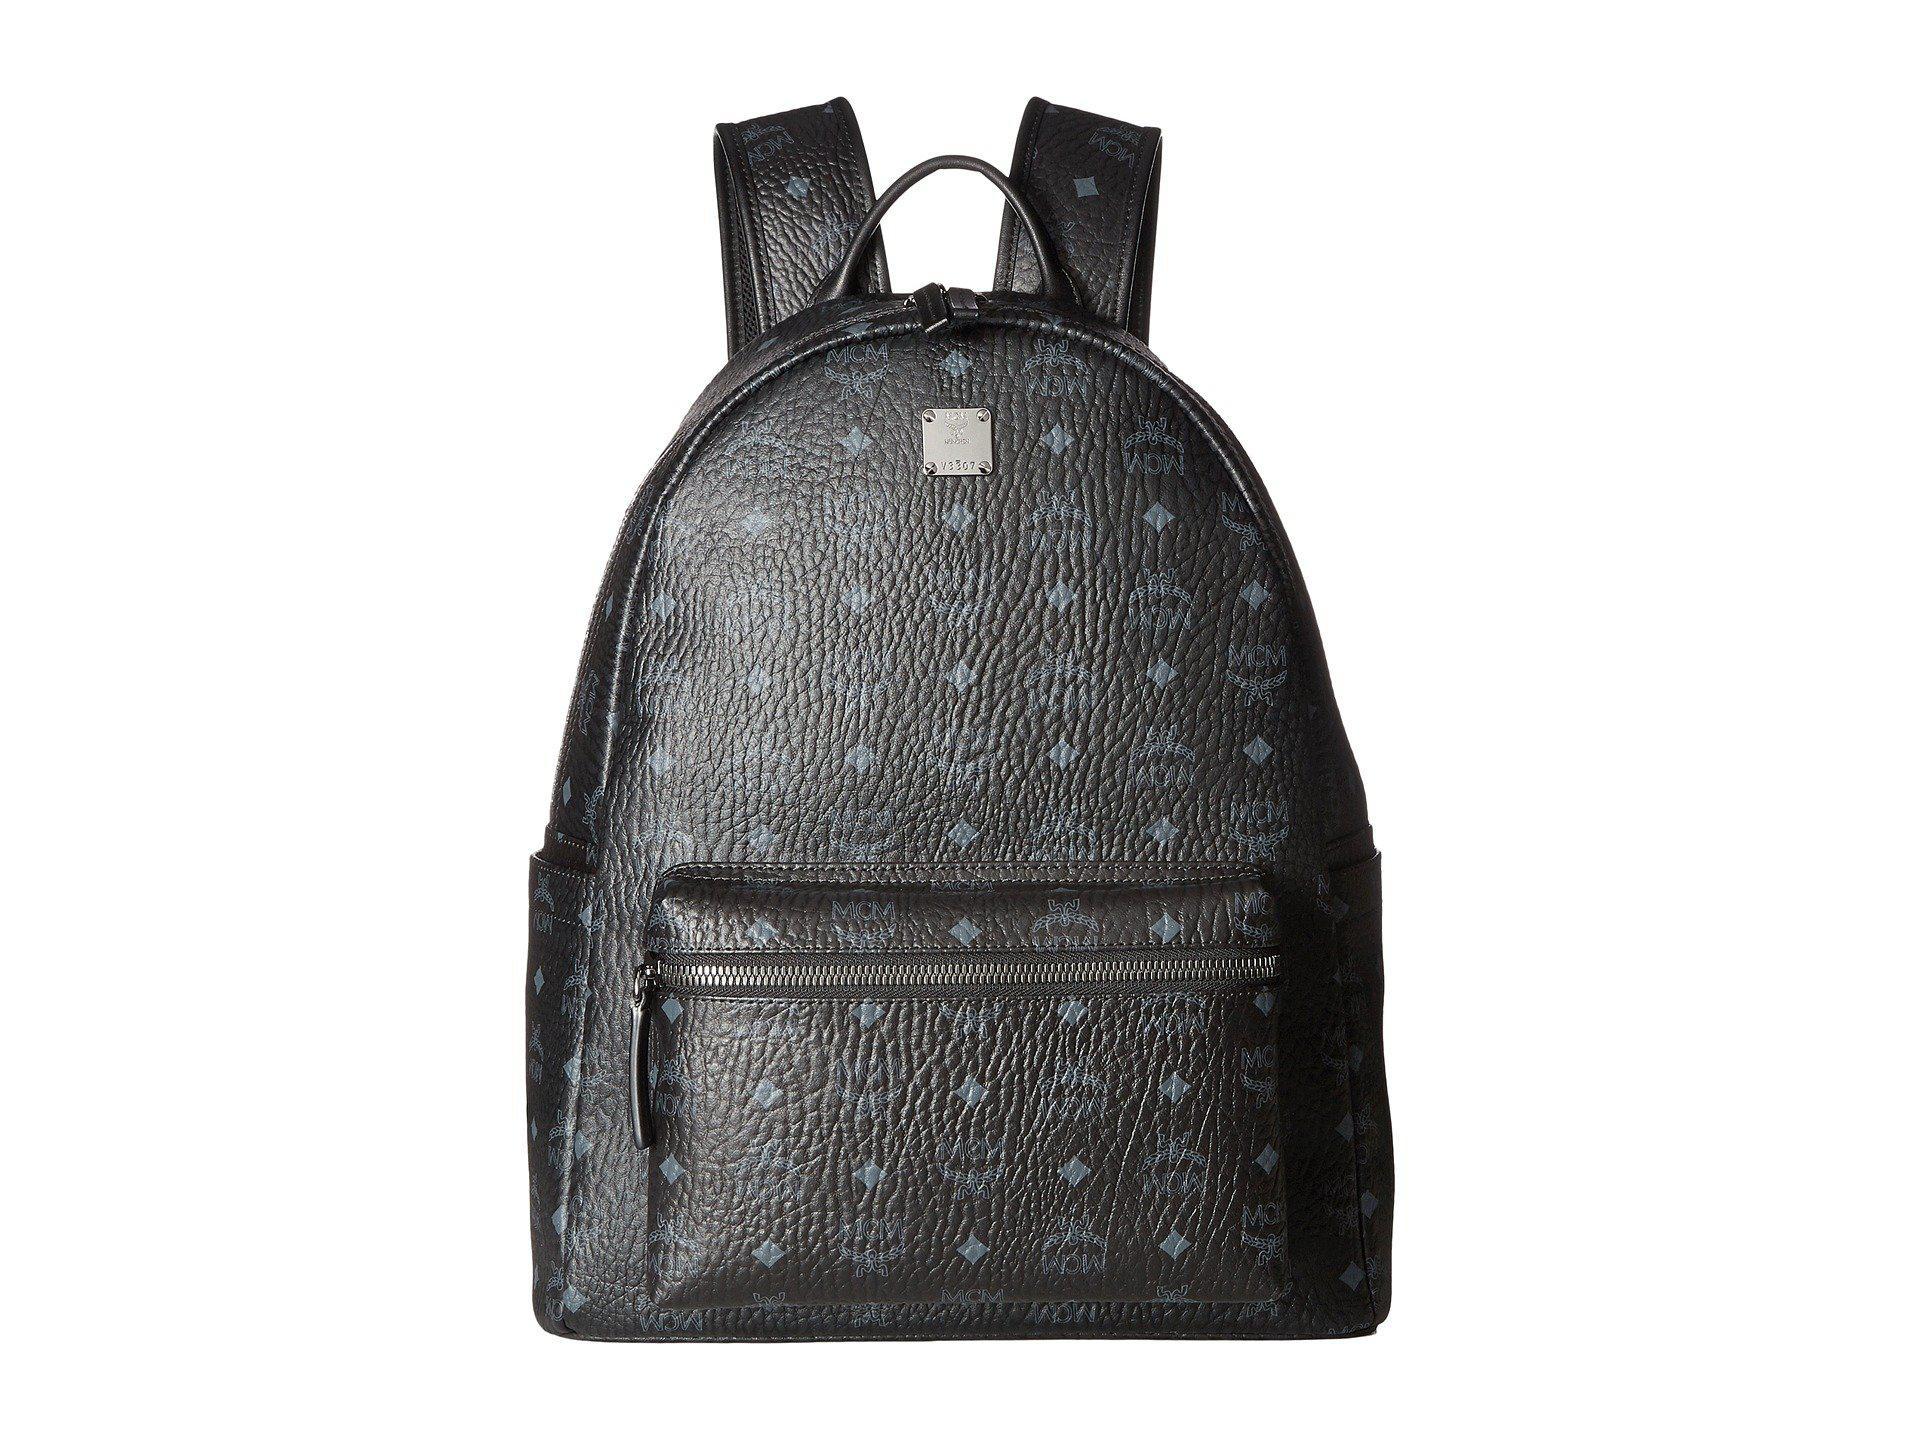 Lyst - MCM Stark No Stud Medium Backpack (red white) Backpack Bags ... e458717c87758